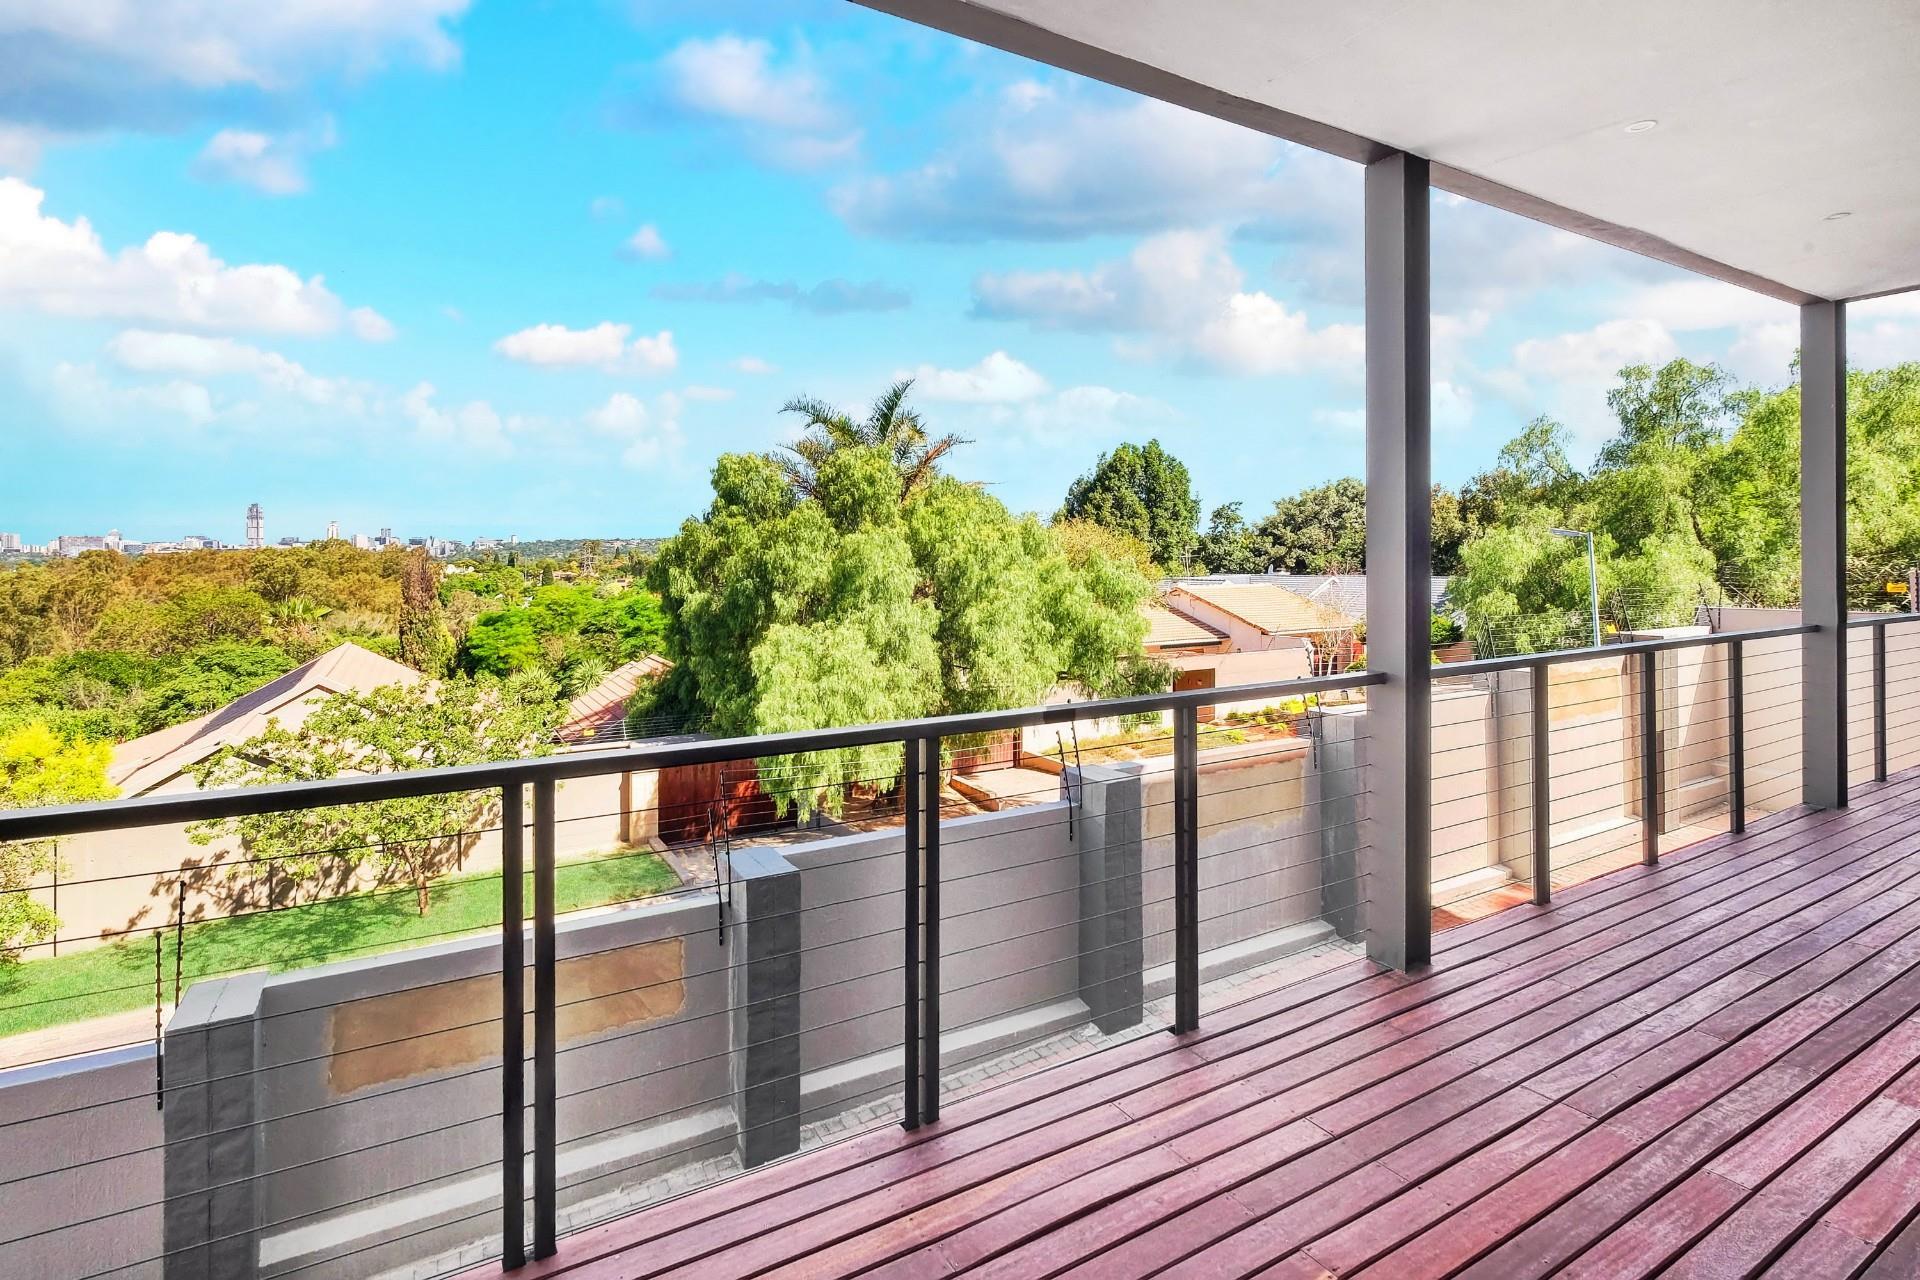 4 Bedroom Apartment / Flat For Sale in Hurlingham Manor